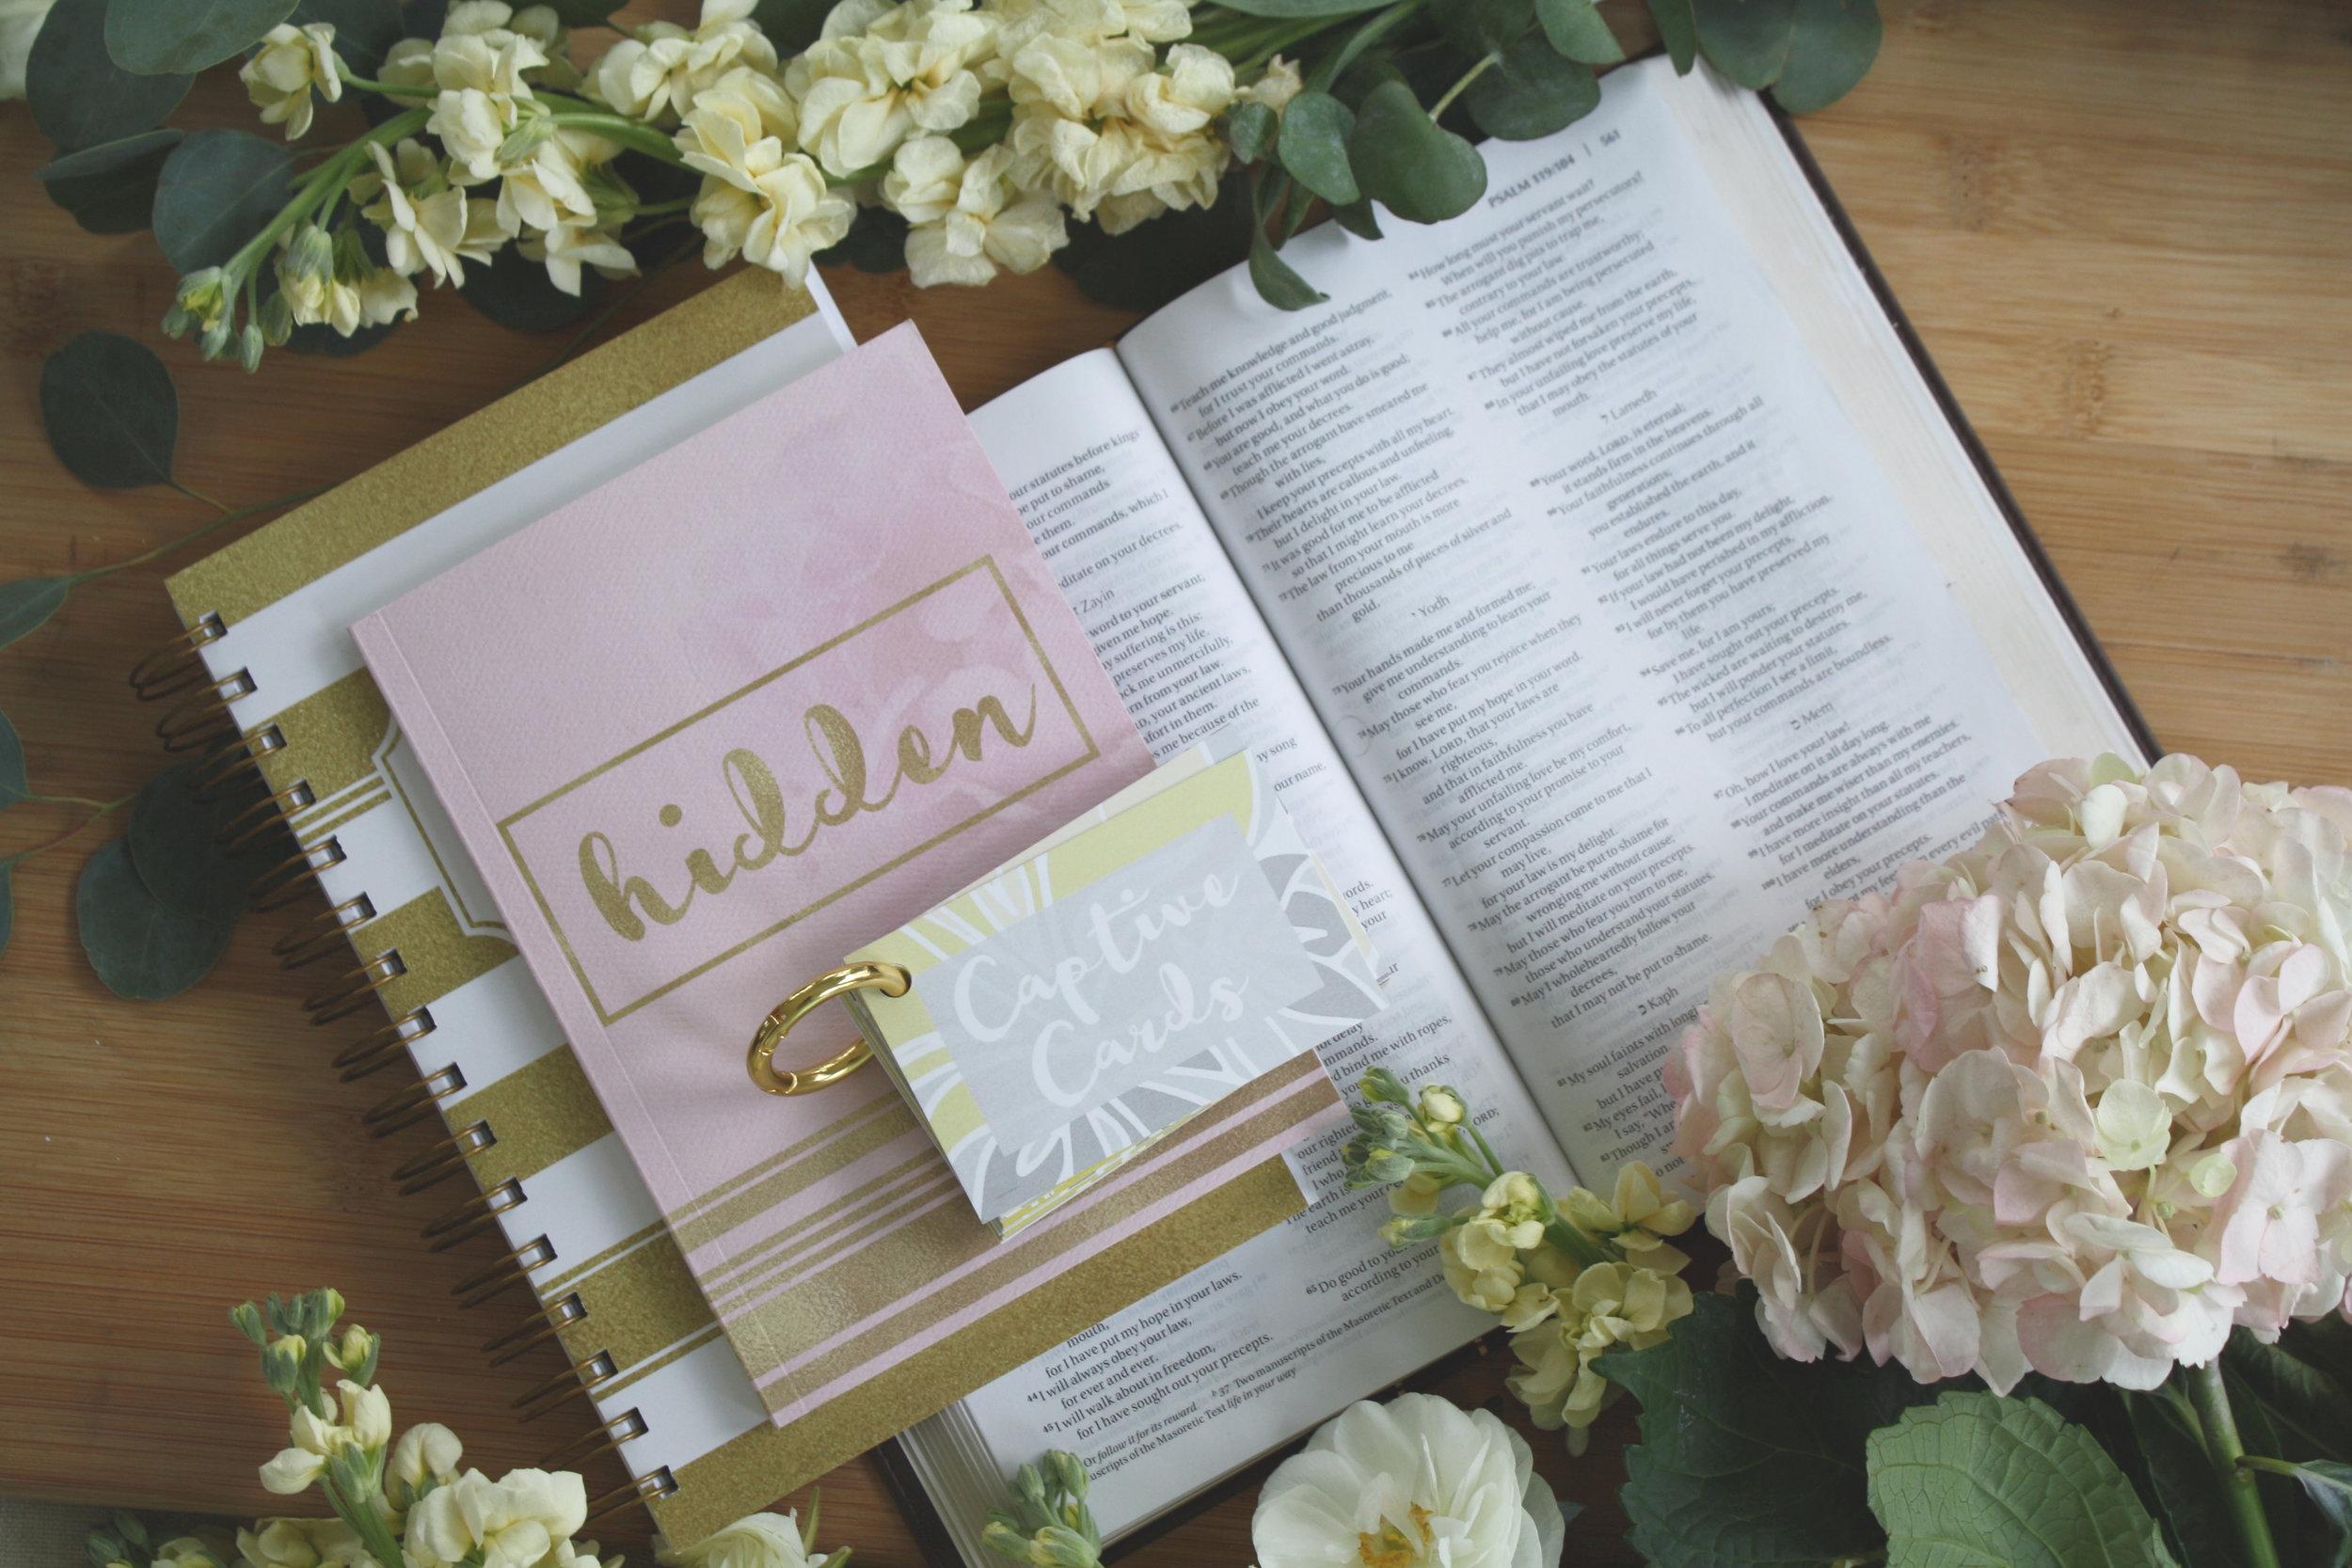 Scripture Memory_Choose Joy_Captive Cards Hidden Your Word in My Heart Journal